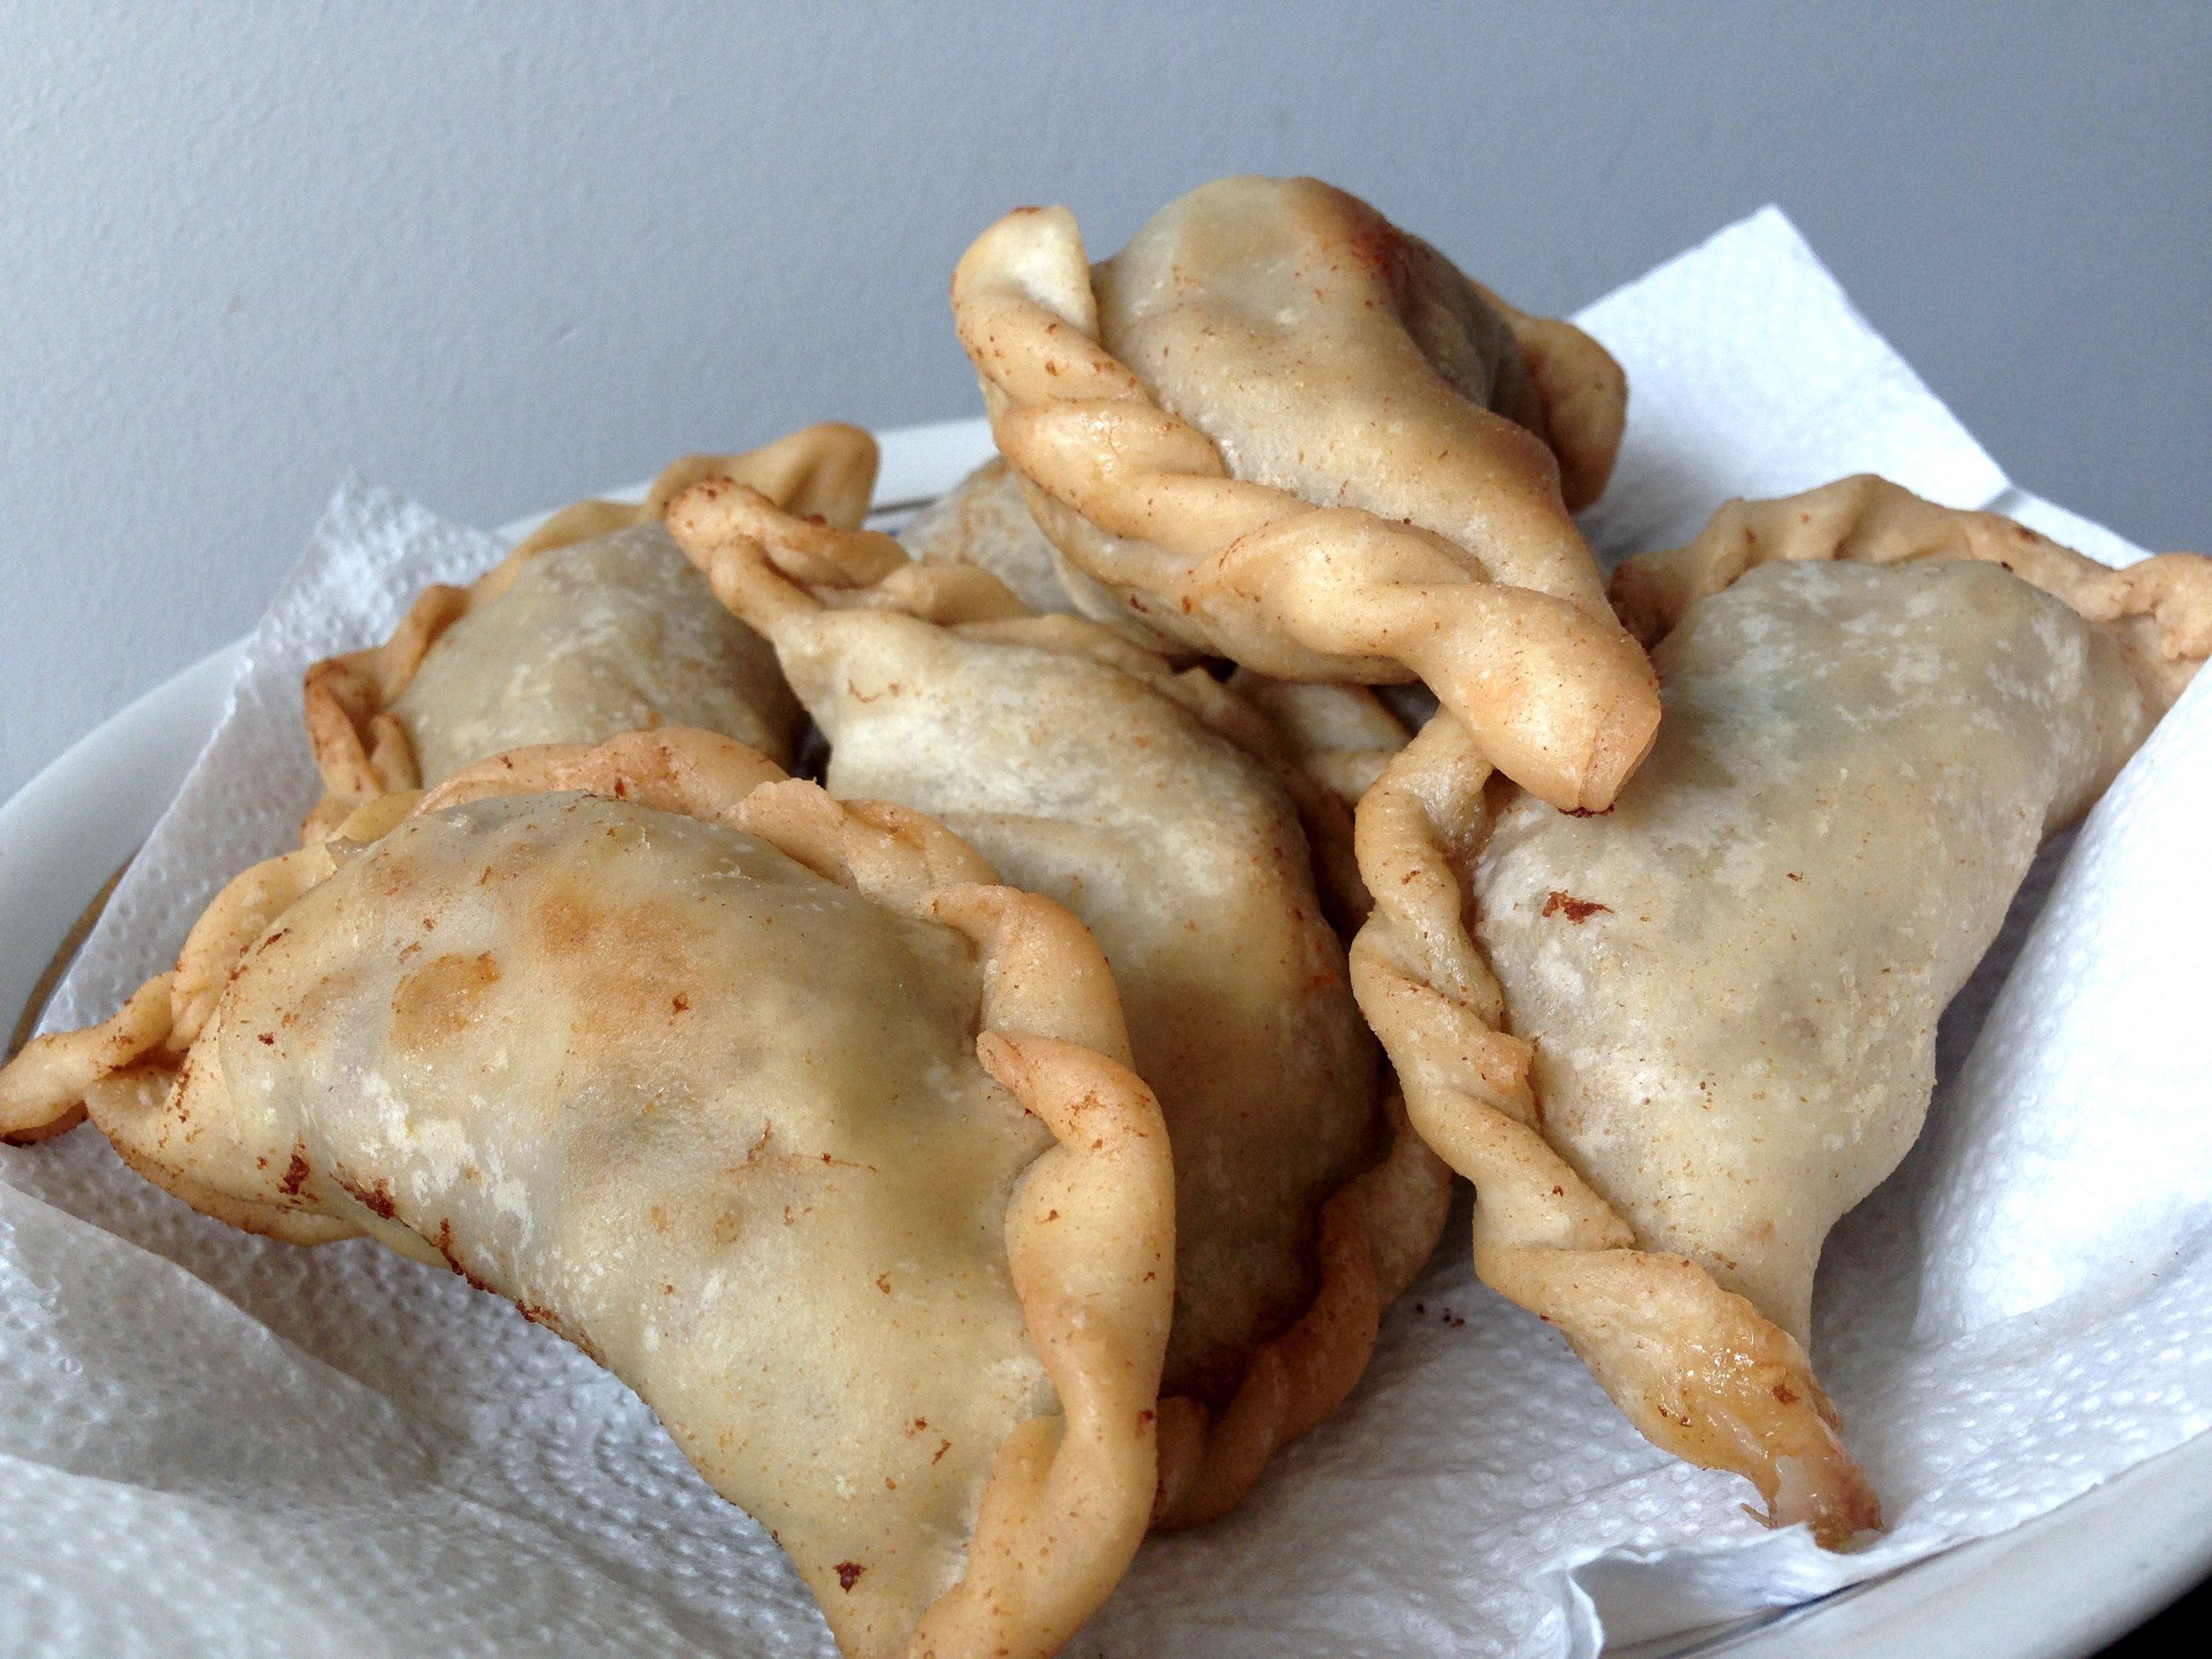 Fried empanadas. Photo by Allison Yates